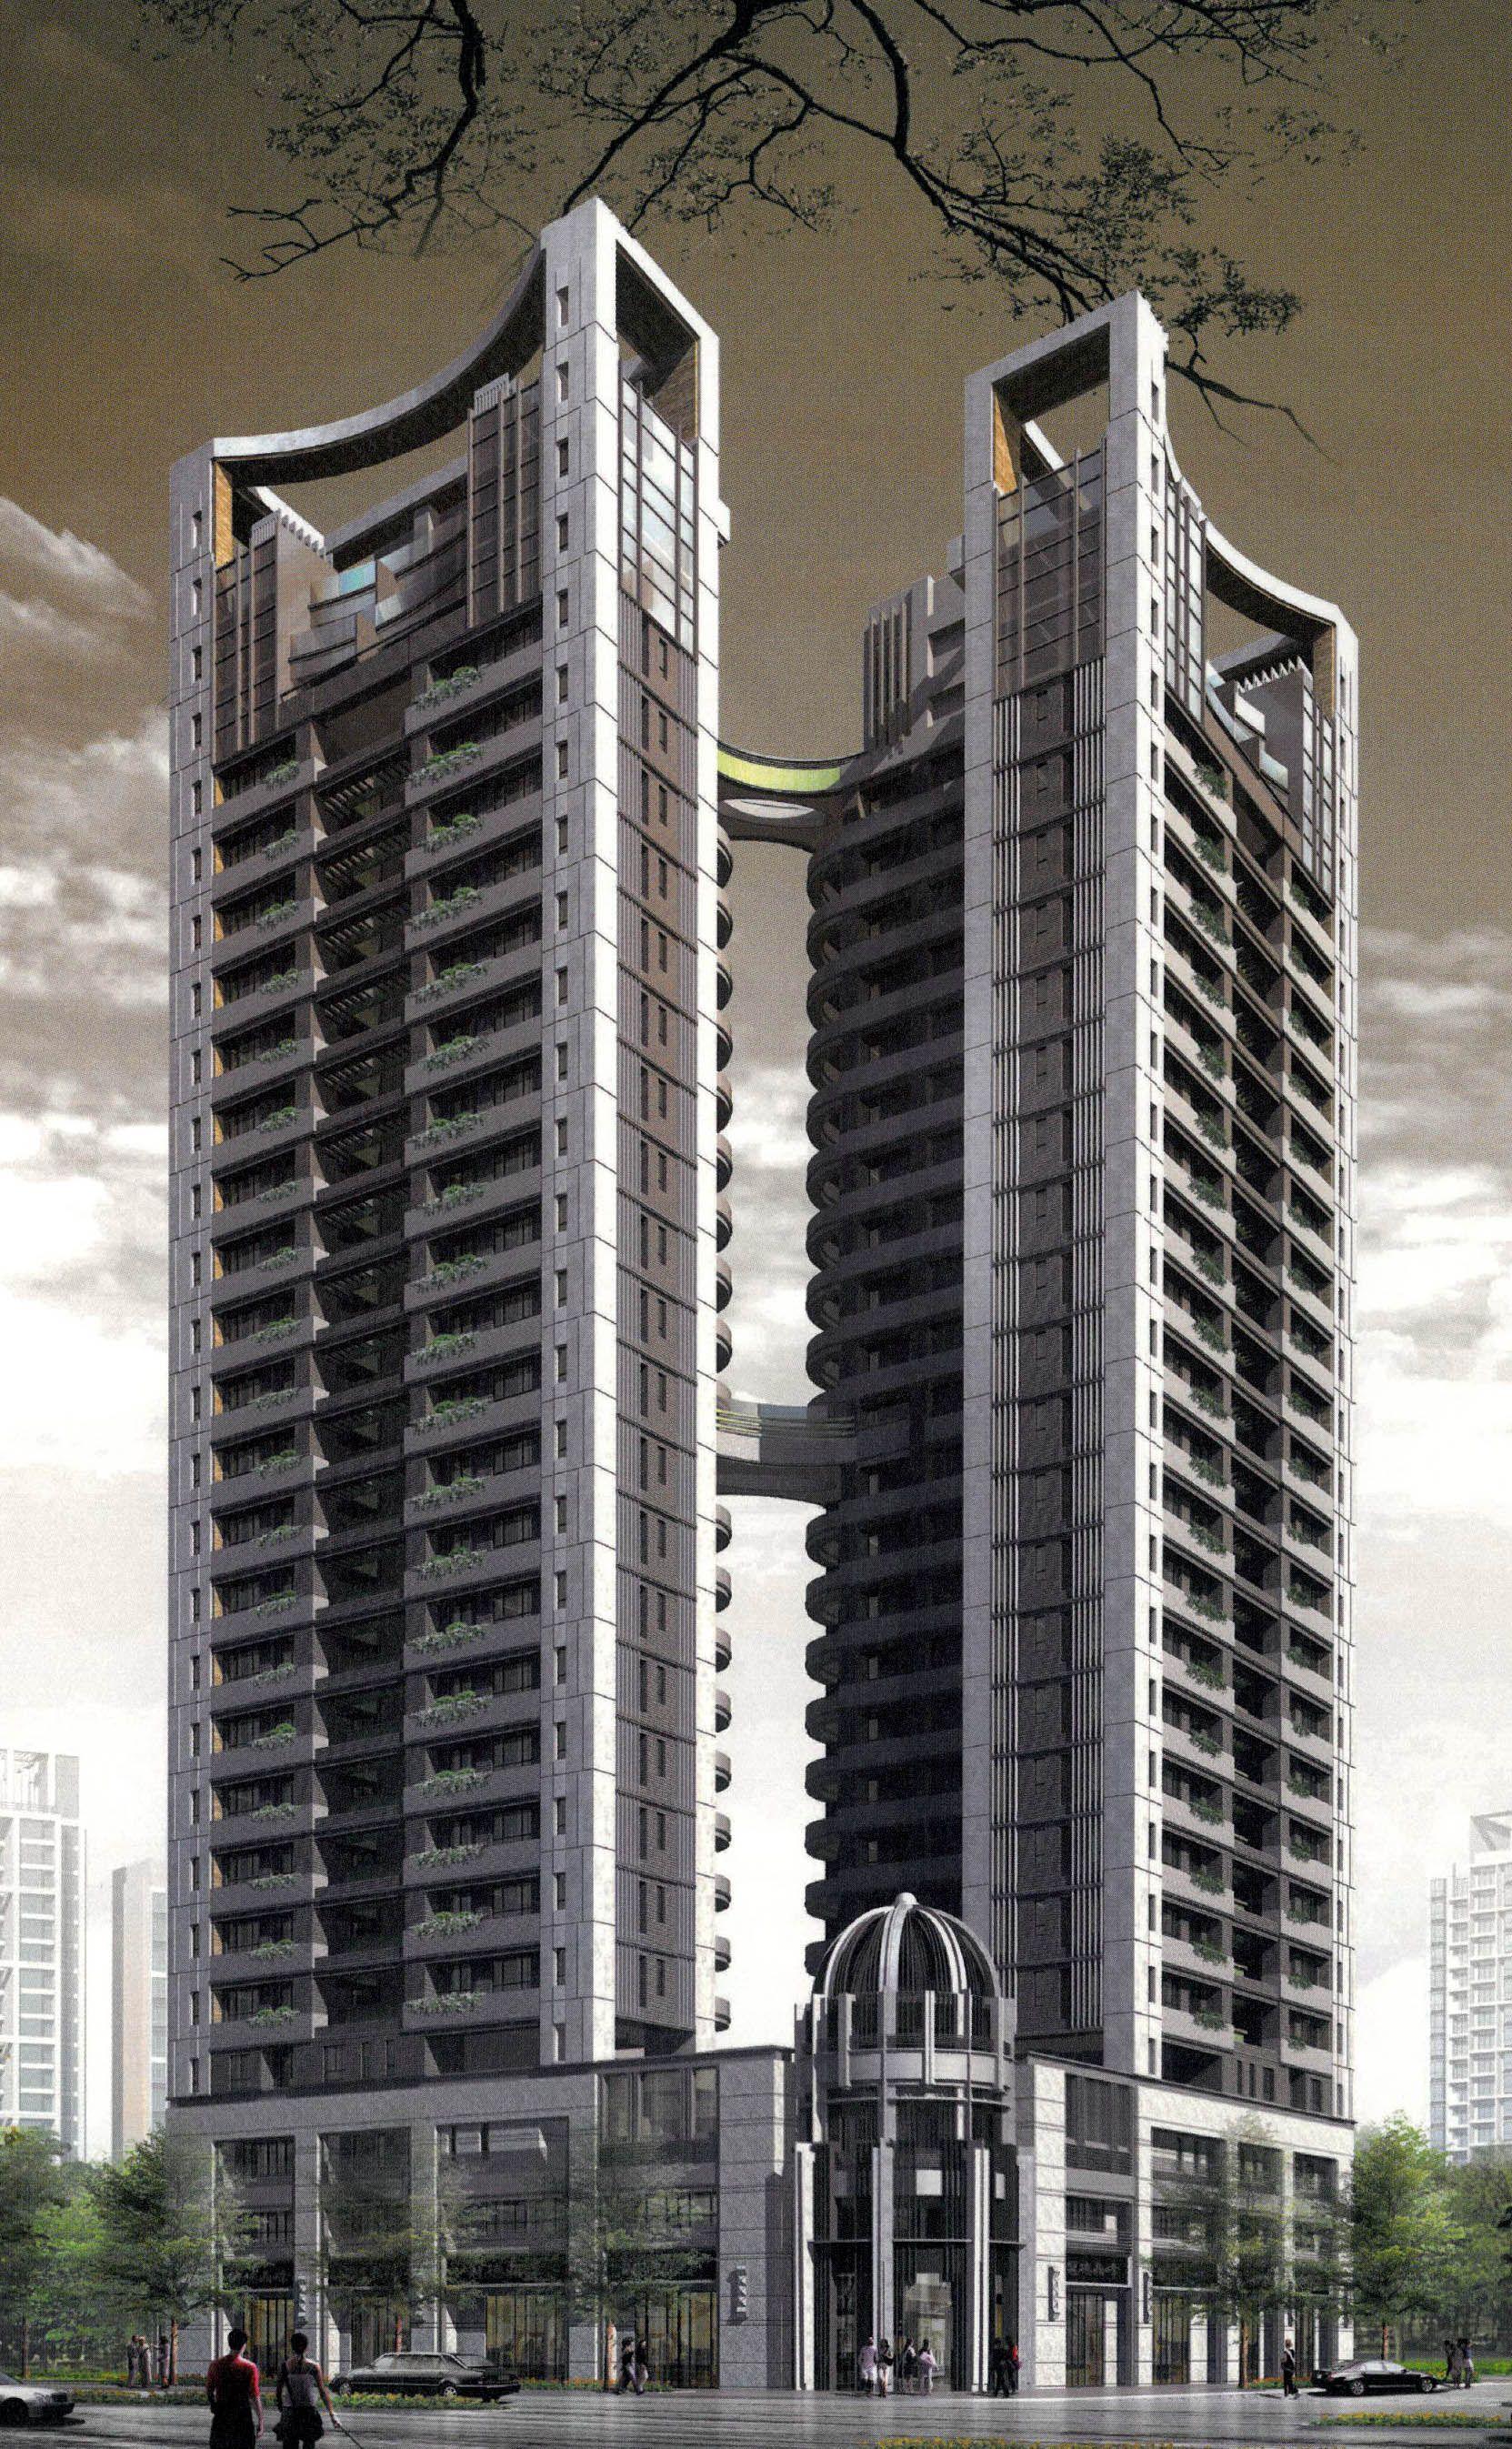 Pin By Landon Blake On Towers Skyscraper Architecture Hotel Architecture Concept Architecture